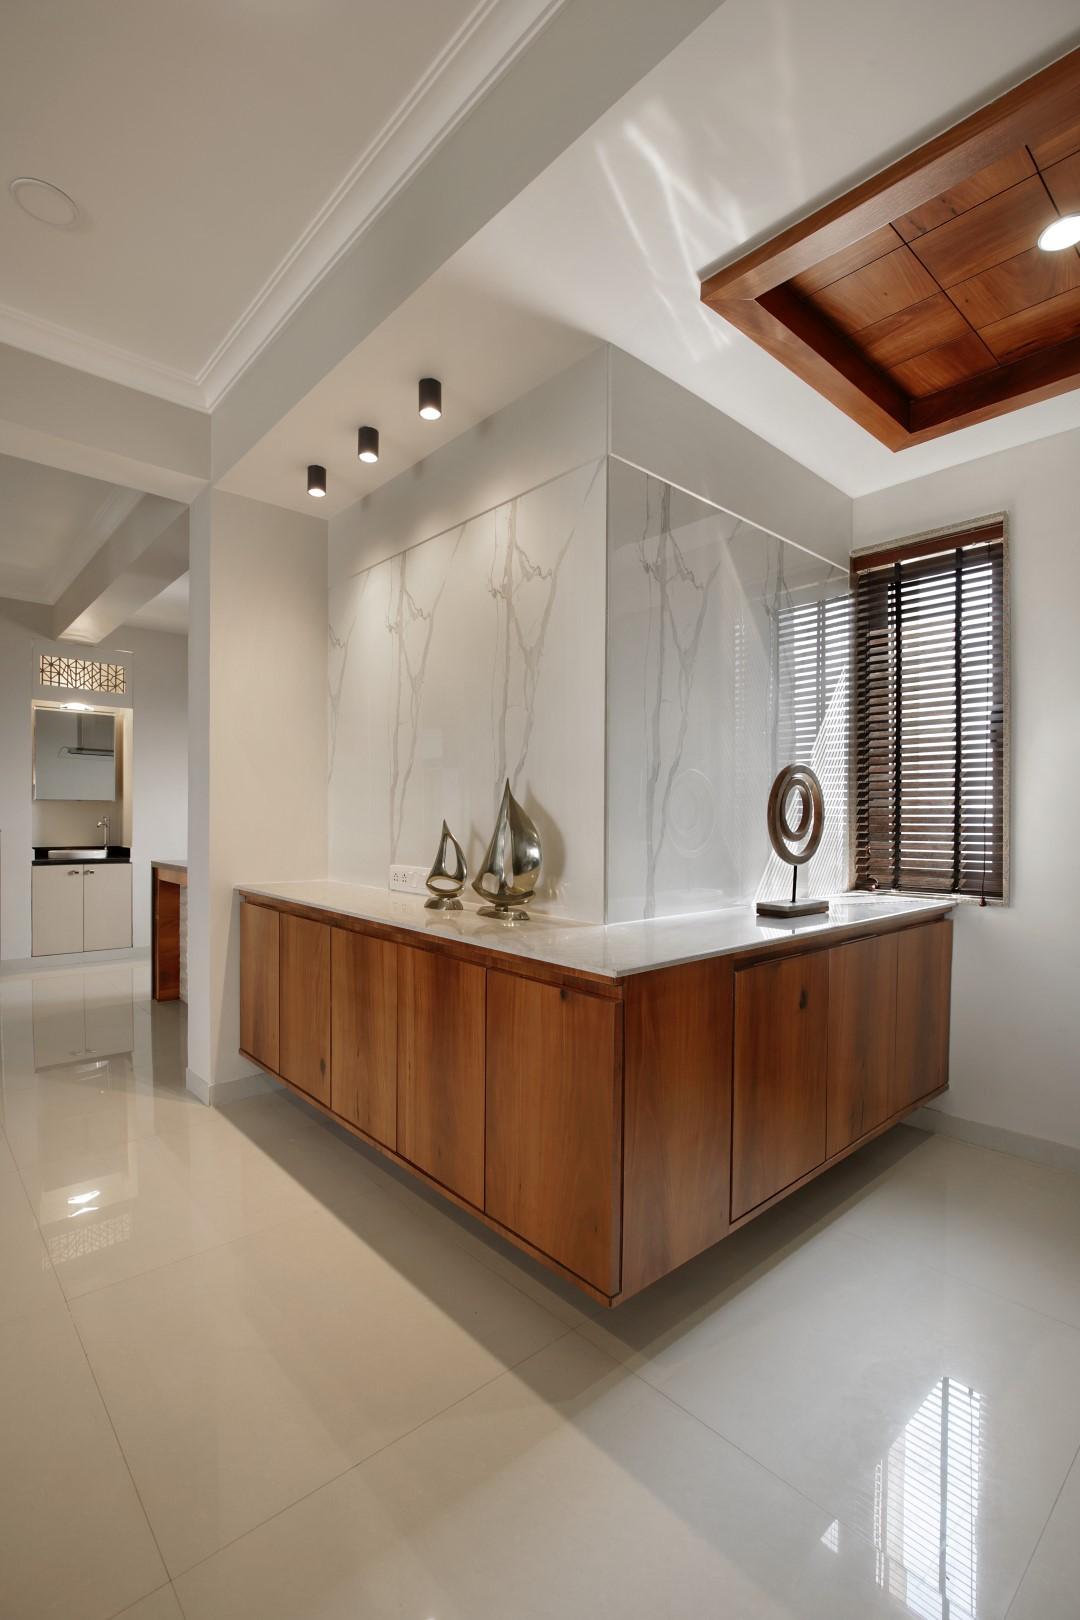 2 bhk interior design studio 7 designs the architects - How many interior designers in the us ...